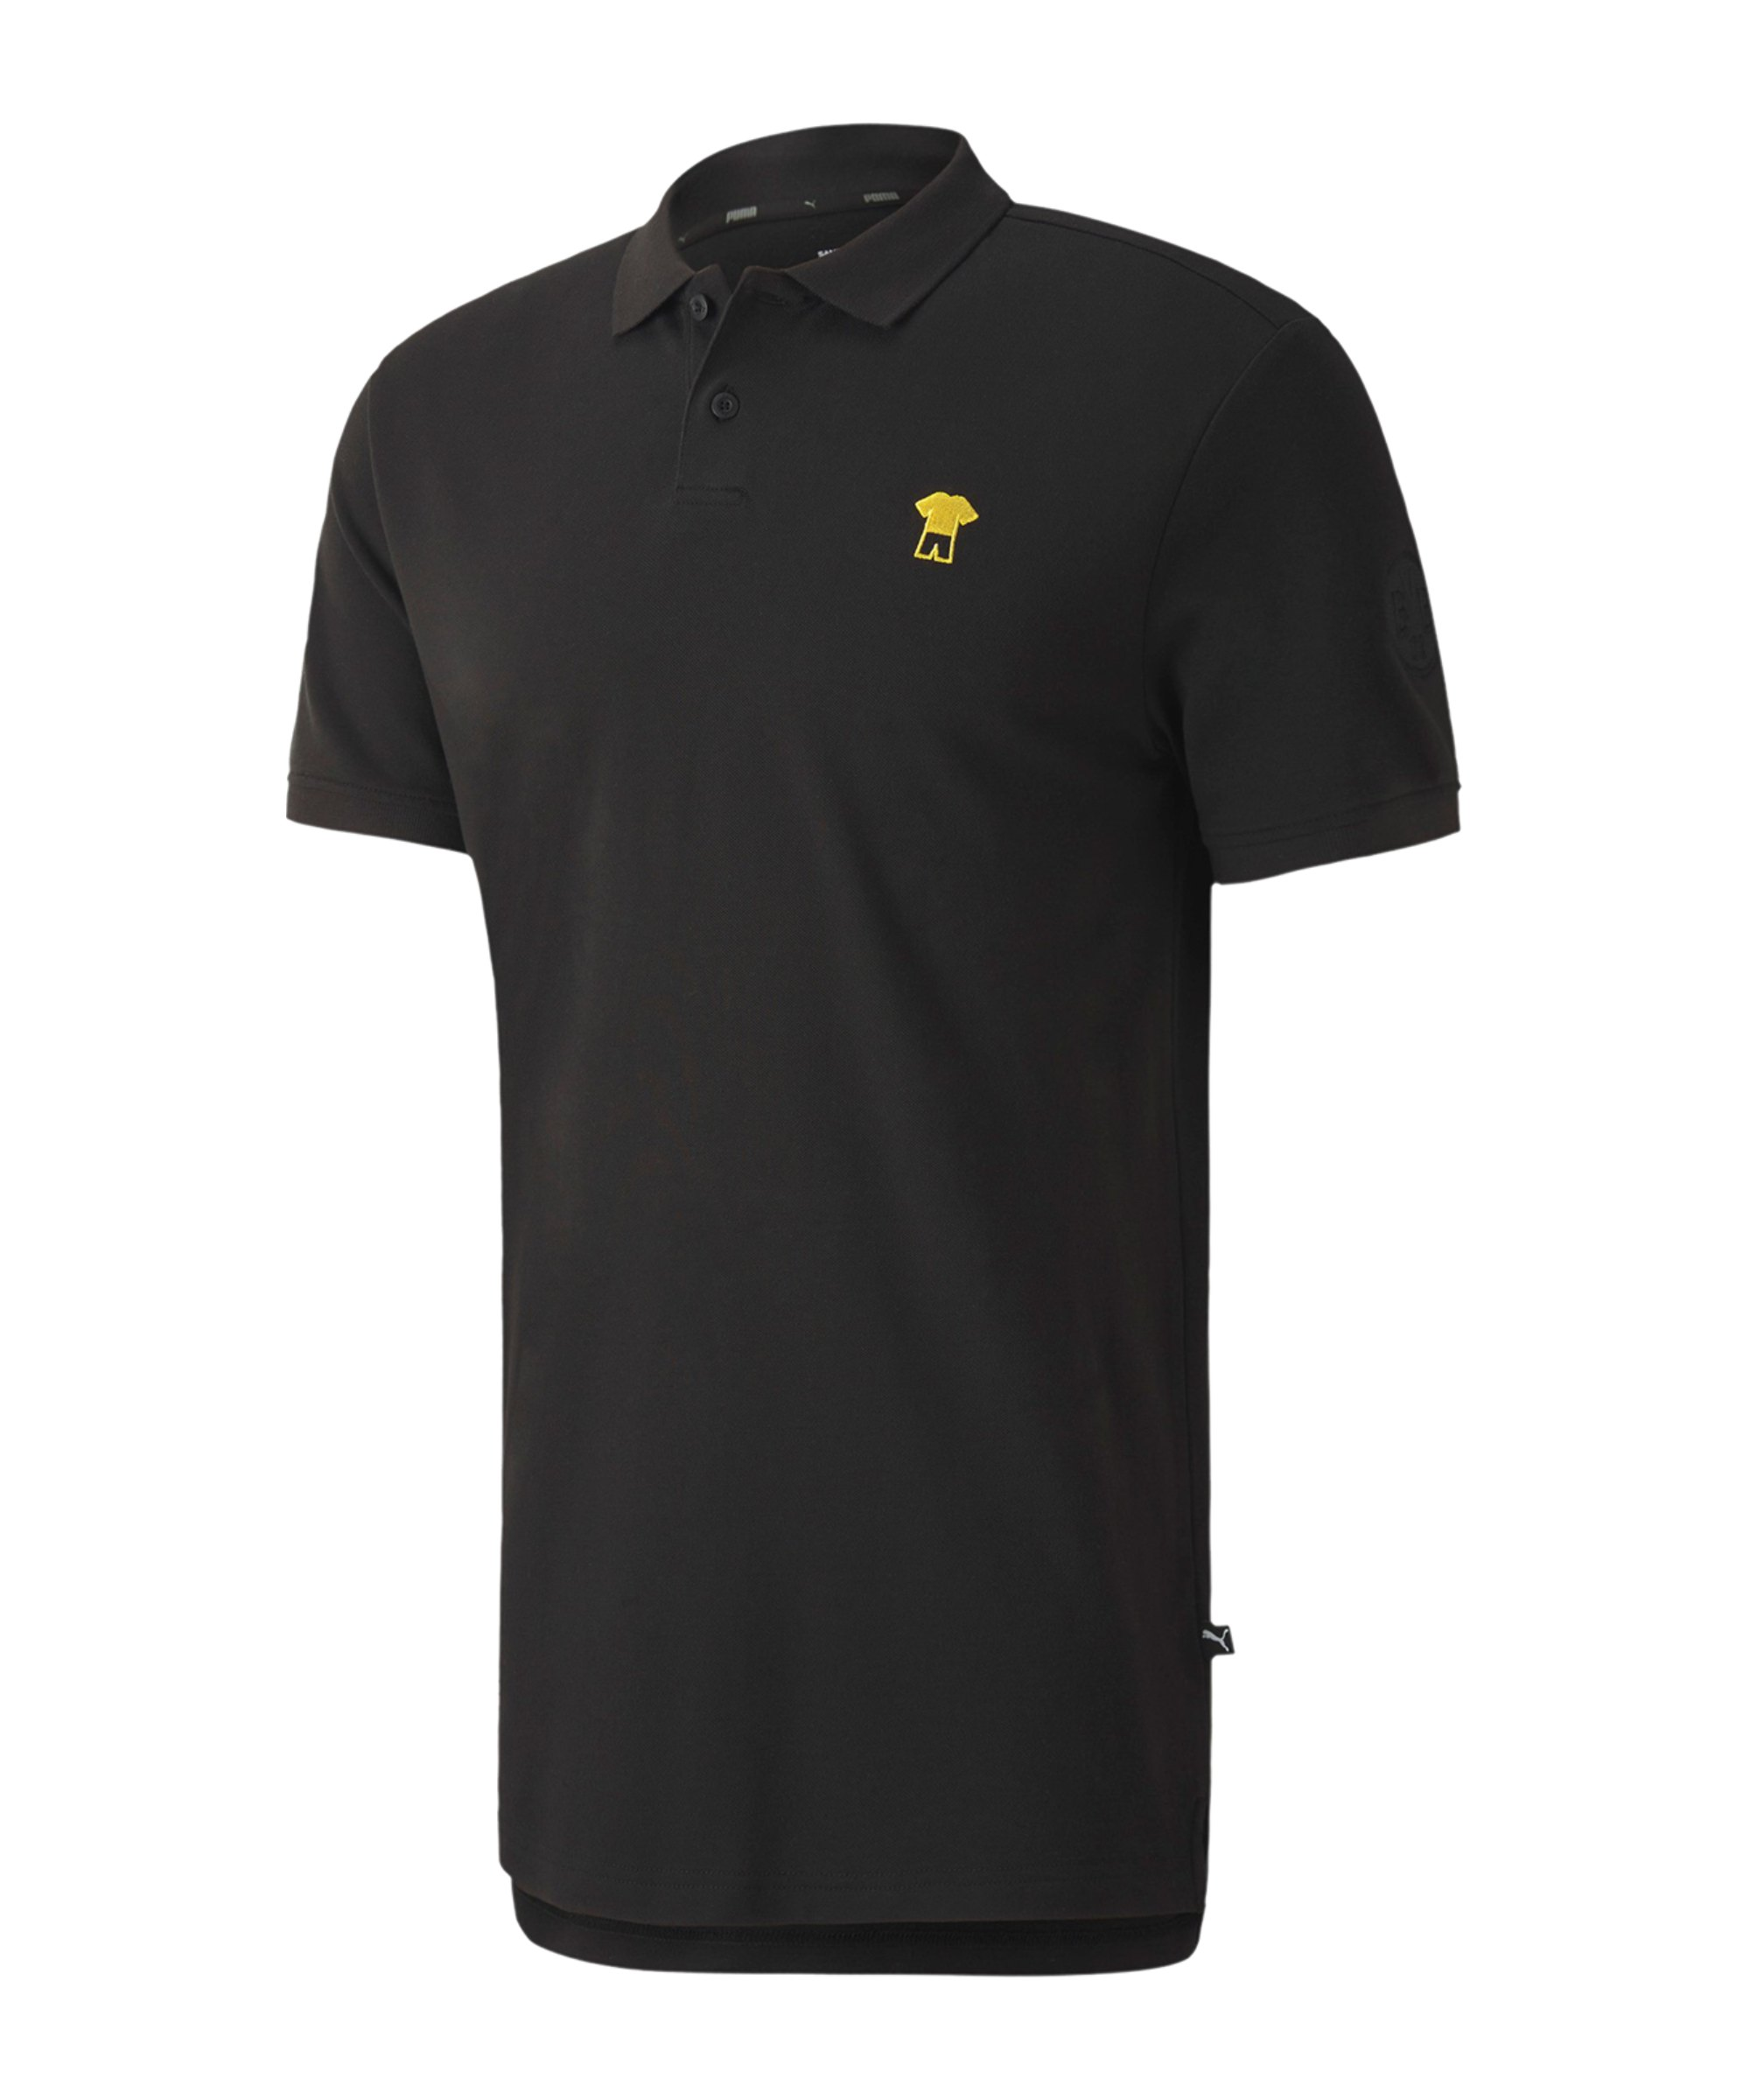 PUMA BVB Dortmund ftblFeat Game Poloshirt F02 - schwarz